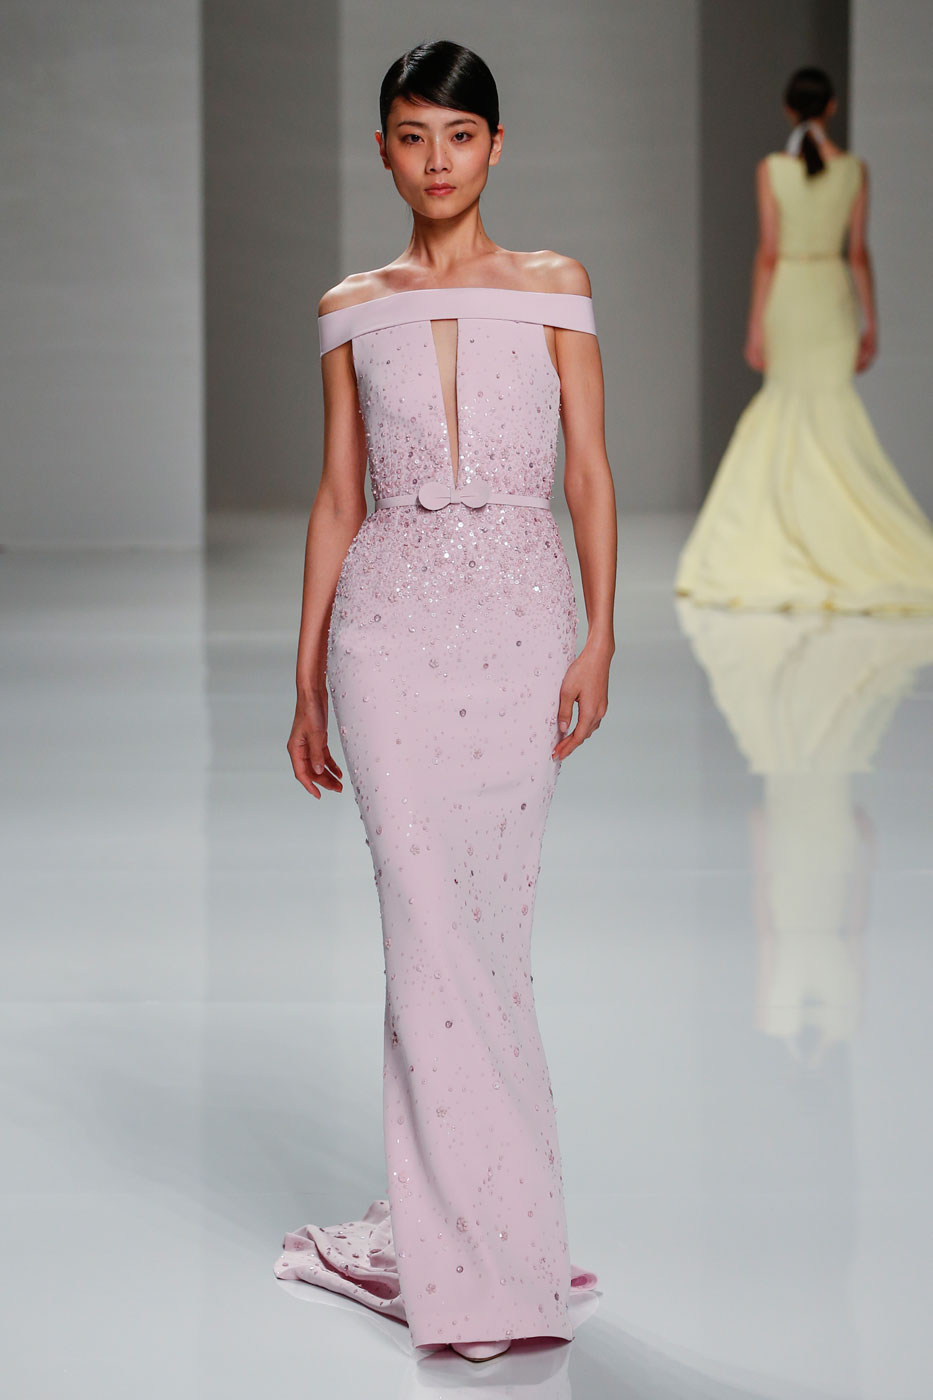 Georges-Hobeika-fashion-runway-show-haute-couture-paris-spring-2015-the-impression-25